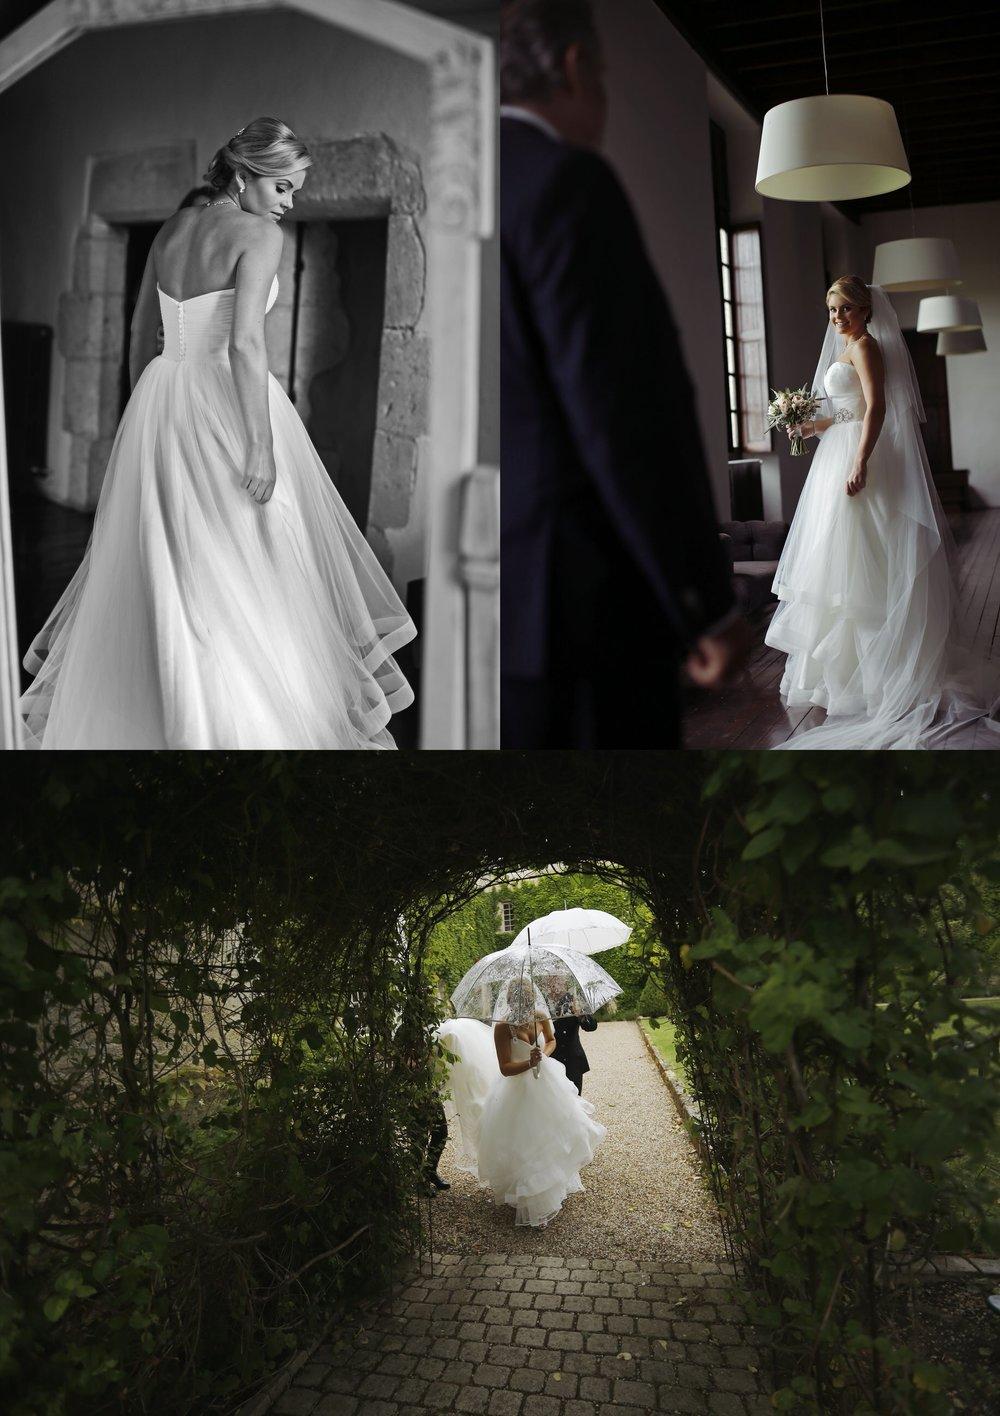 brett-harkness-chateau-rigaud-wedding-france-wedding-photographer_0003.jpg